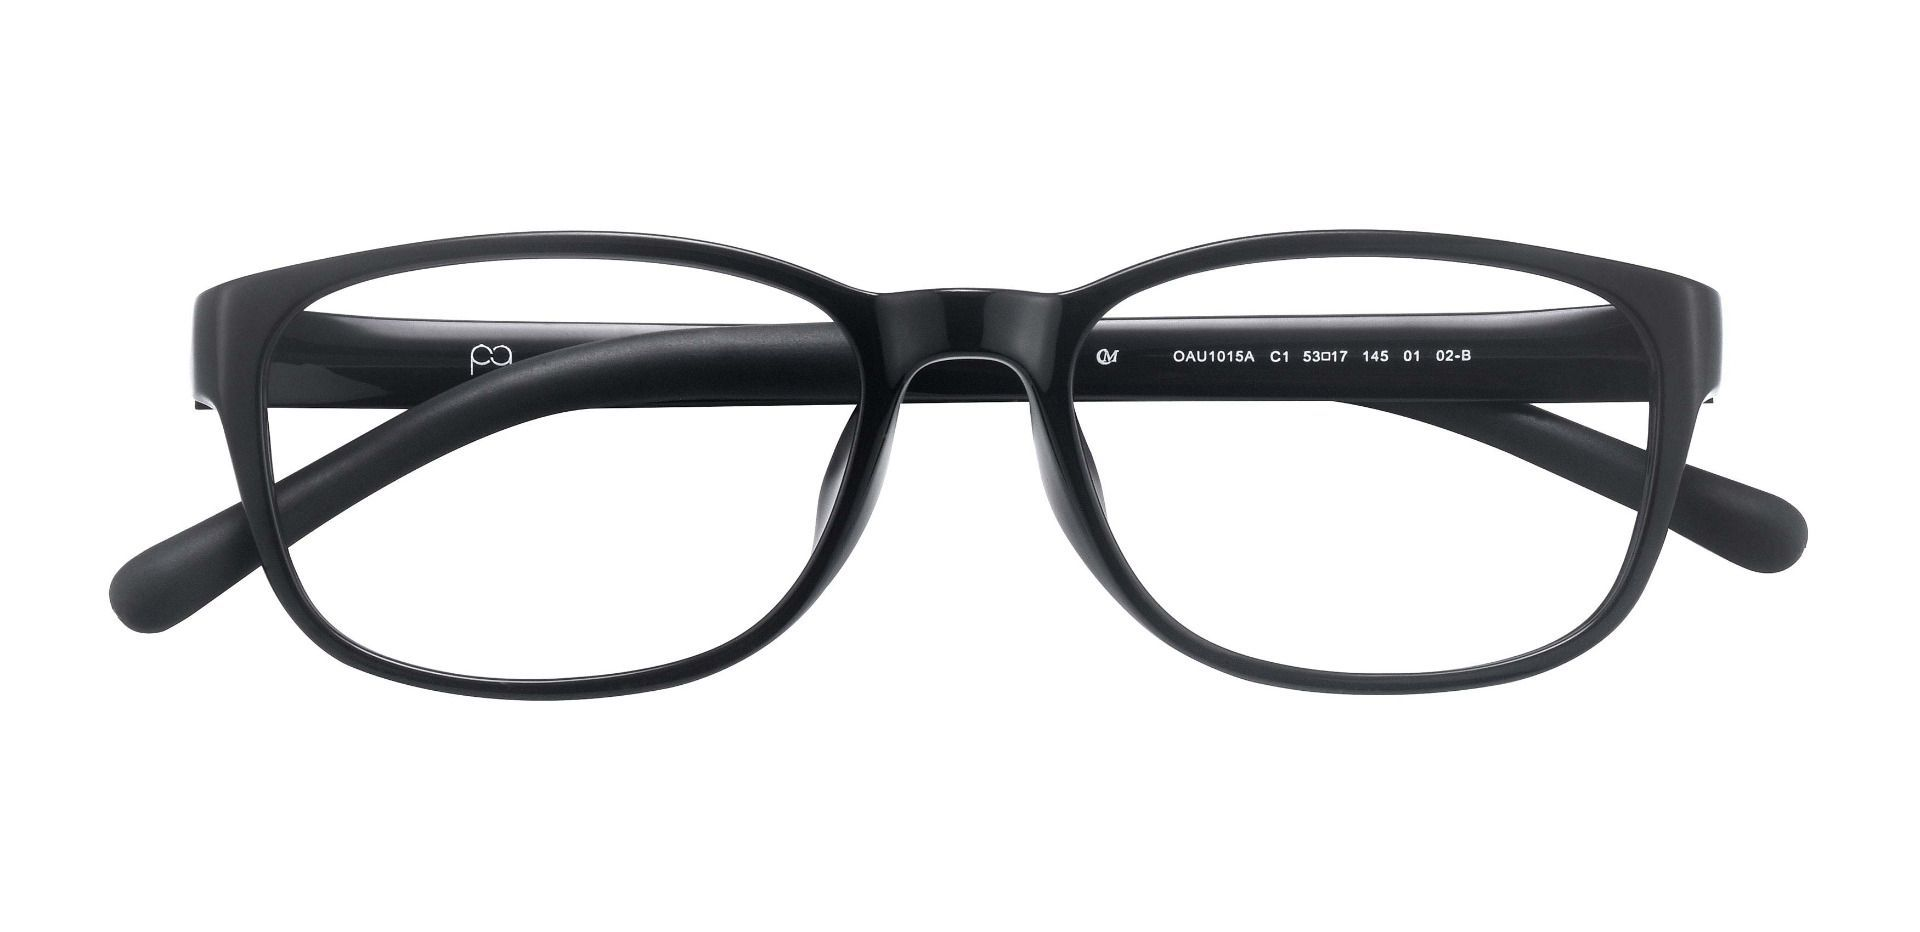 Dorado Oval Prescription Glasses - Black